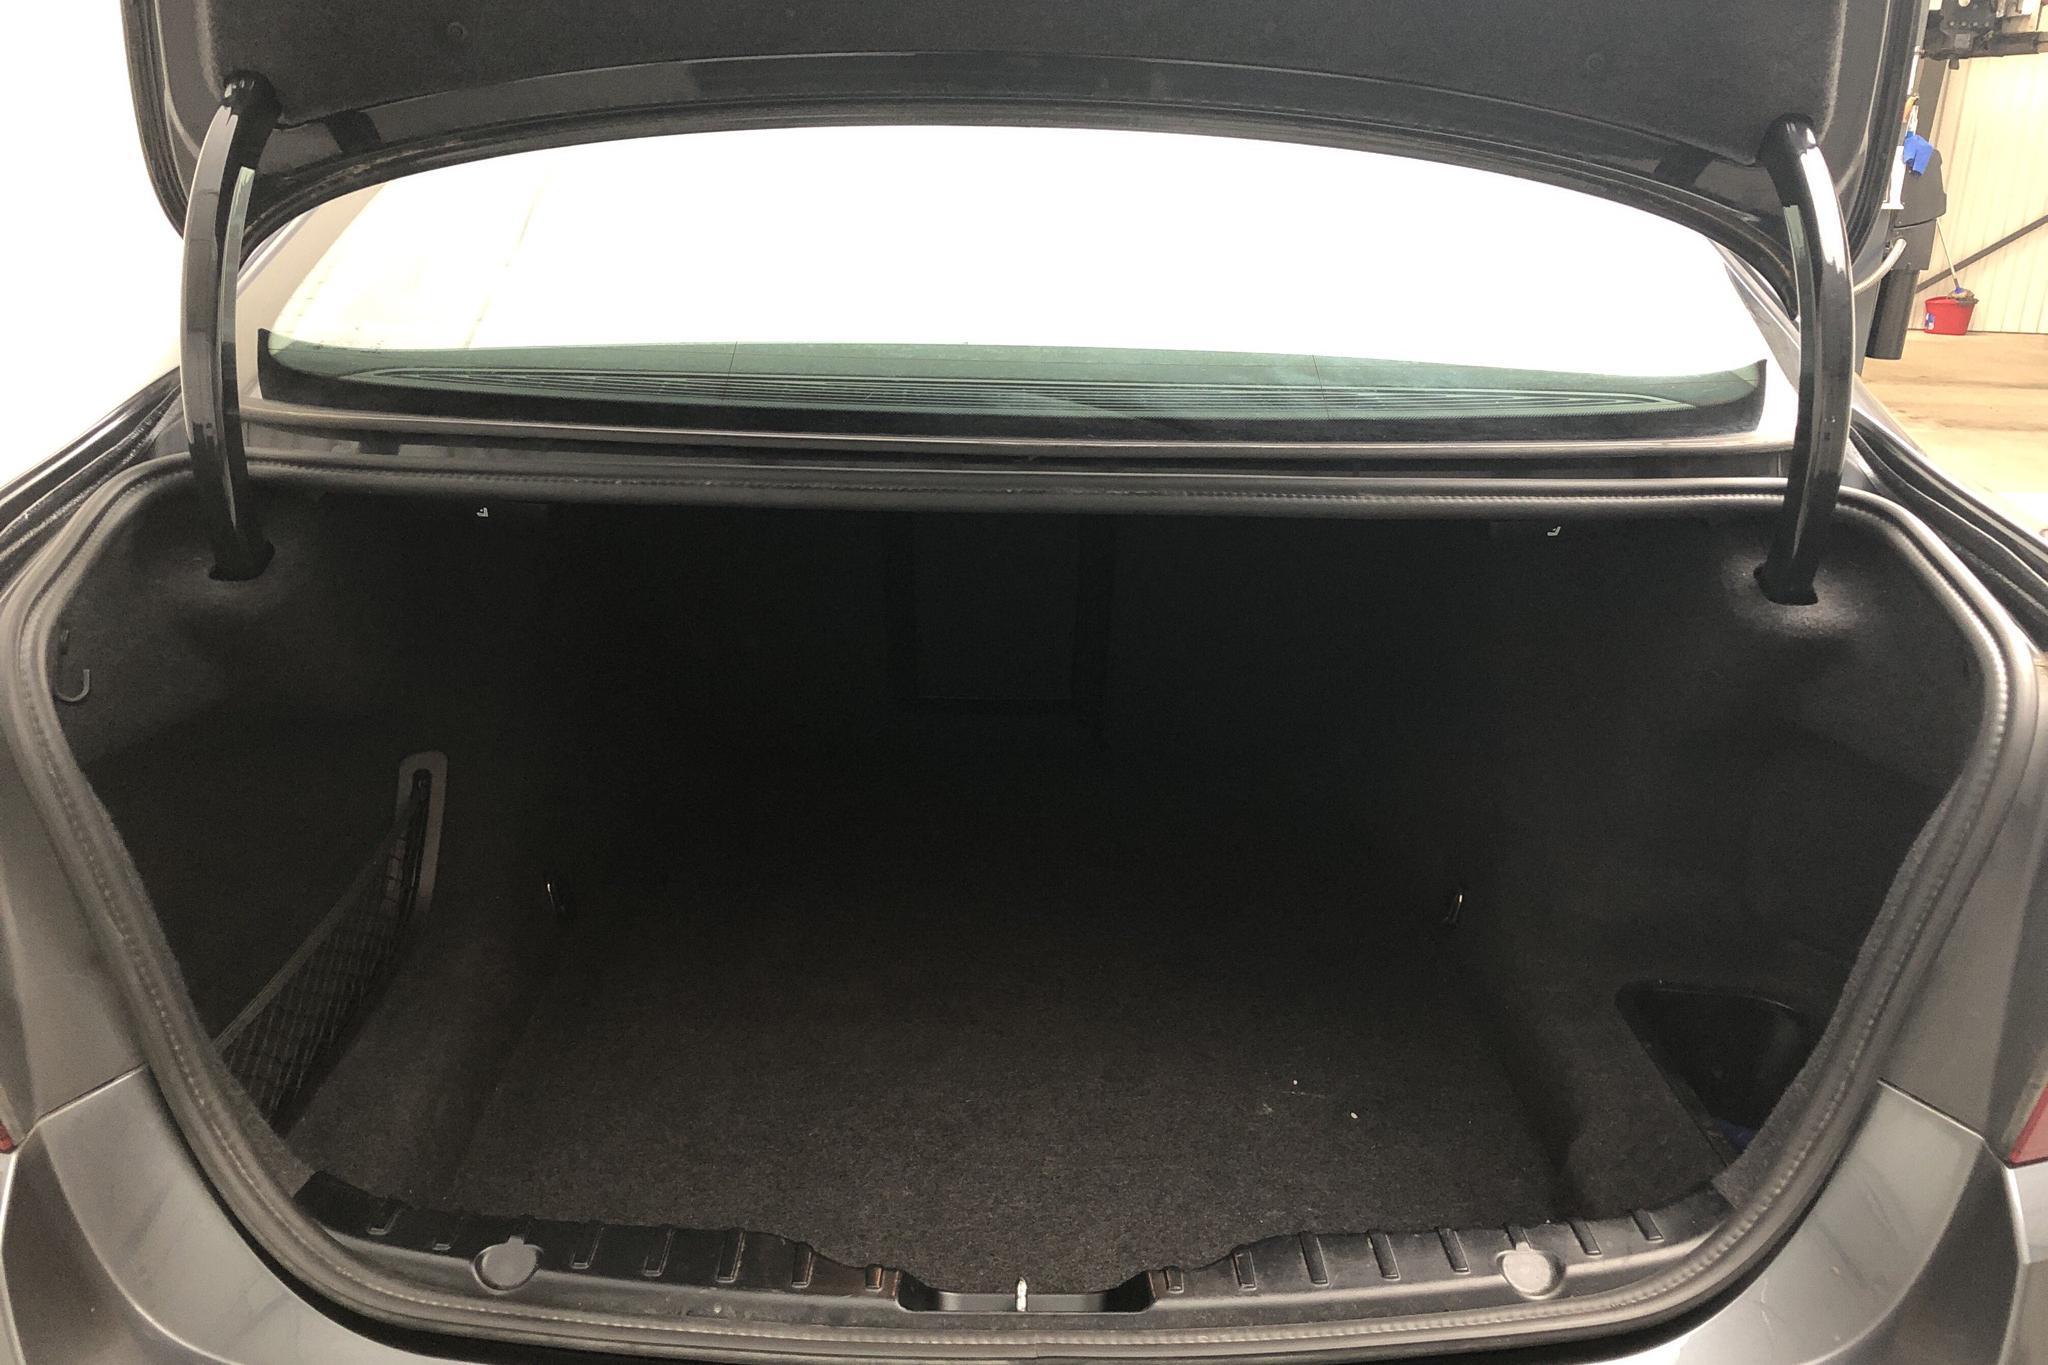 BMW 520d xDrive Sedan, F10 (190hk) - 60 090 km - Automatic - gray - 2016